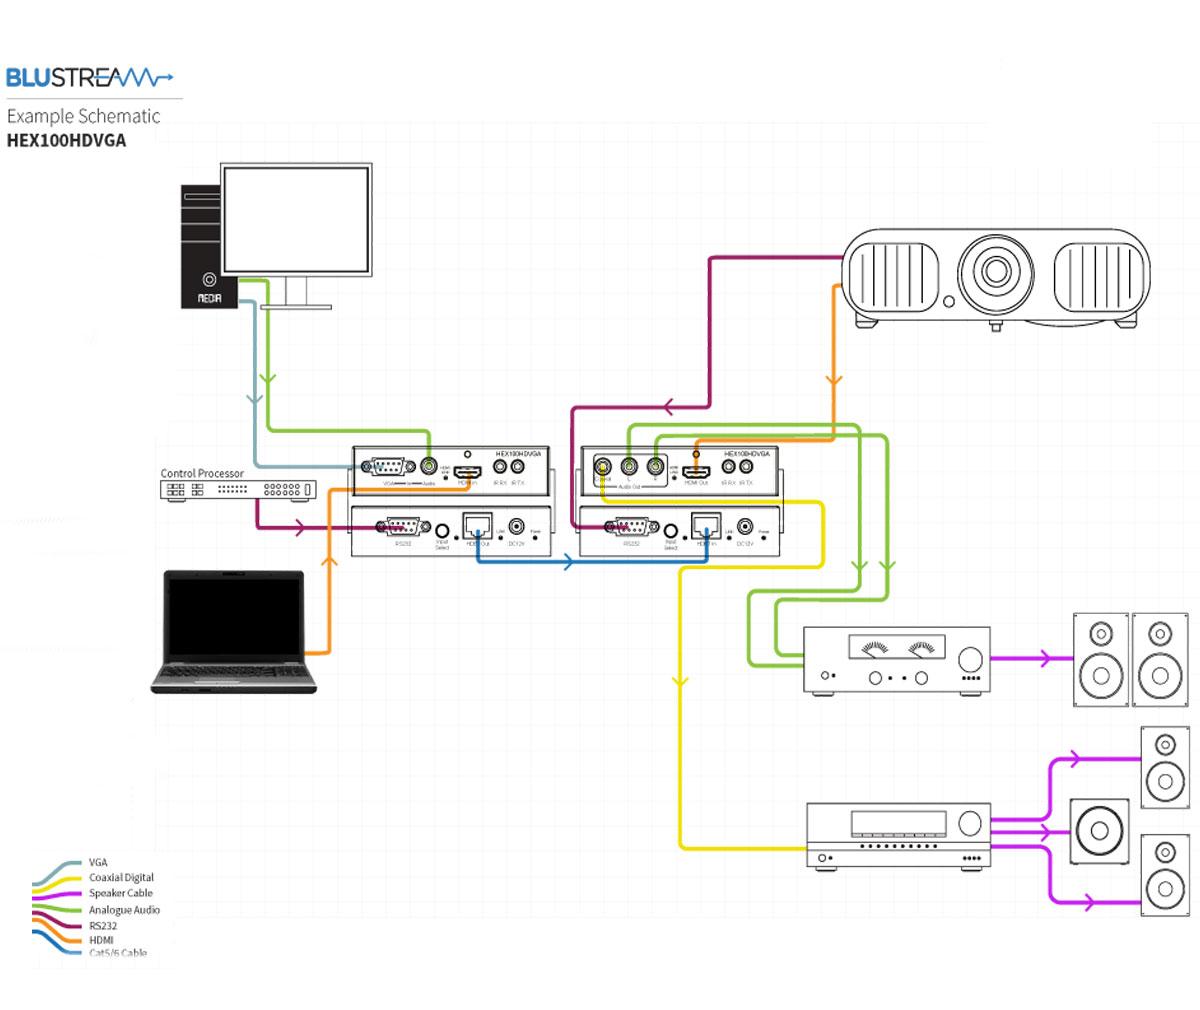 Blustream HEX100HDVGA-TX HDBaseT Extender Transmittor ONLY Schematic